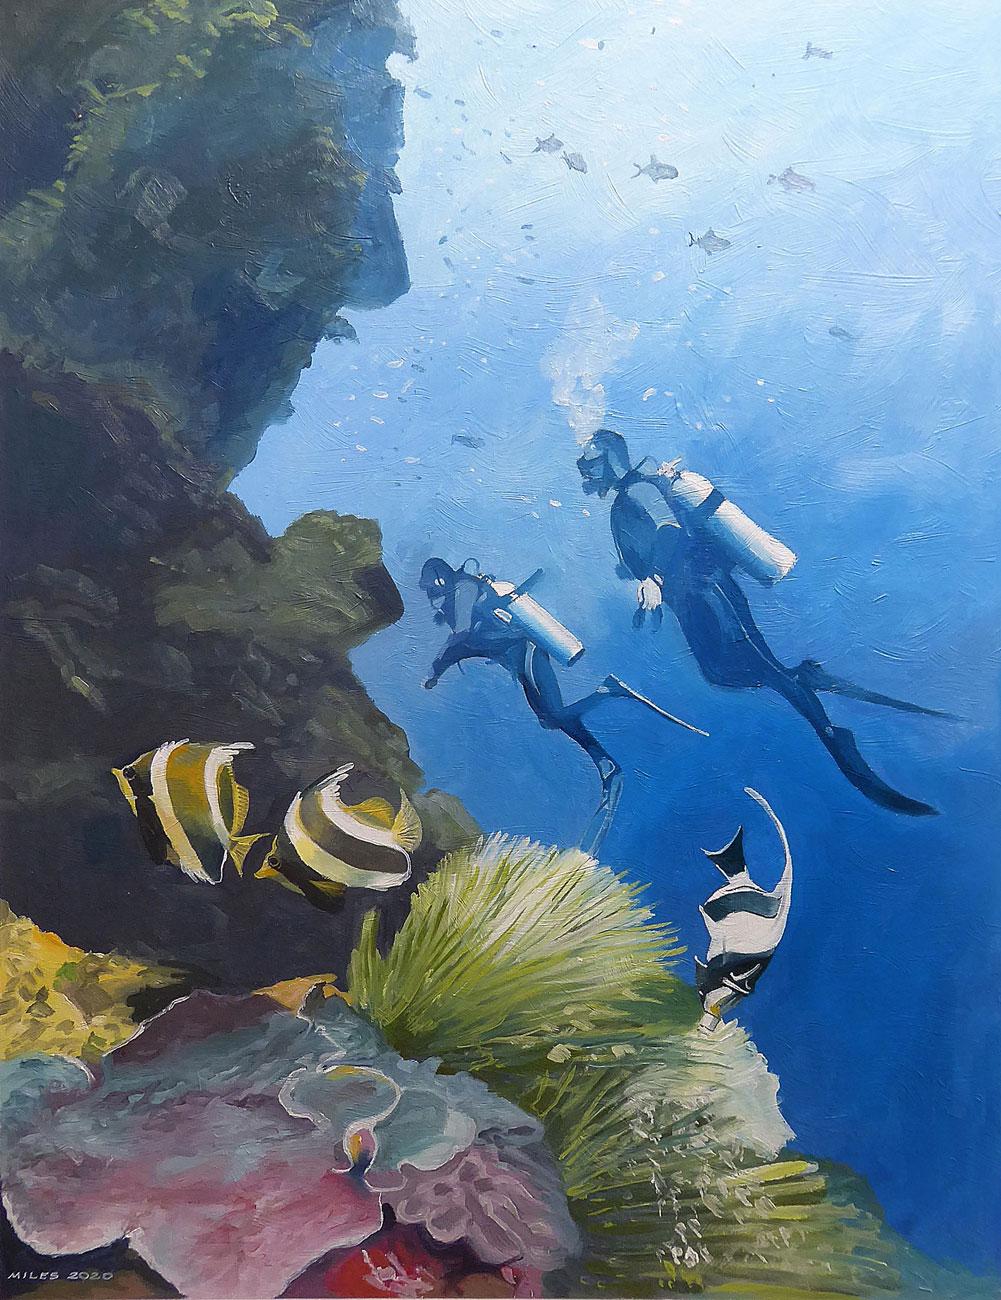 Diving the wall in Bunaken National Marine Park